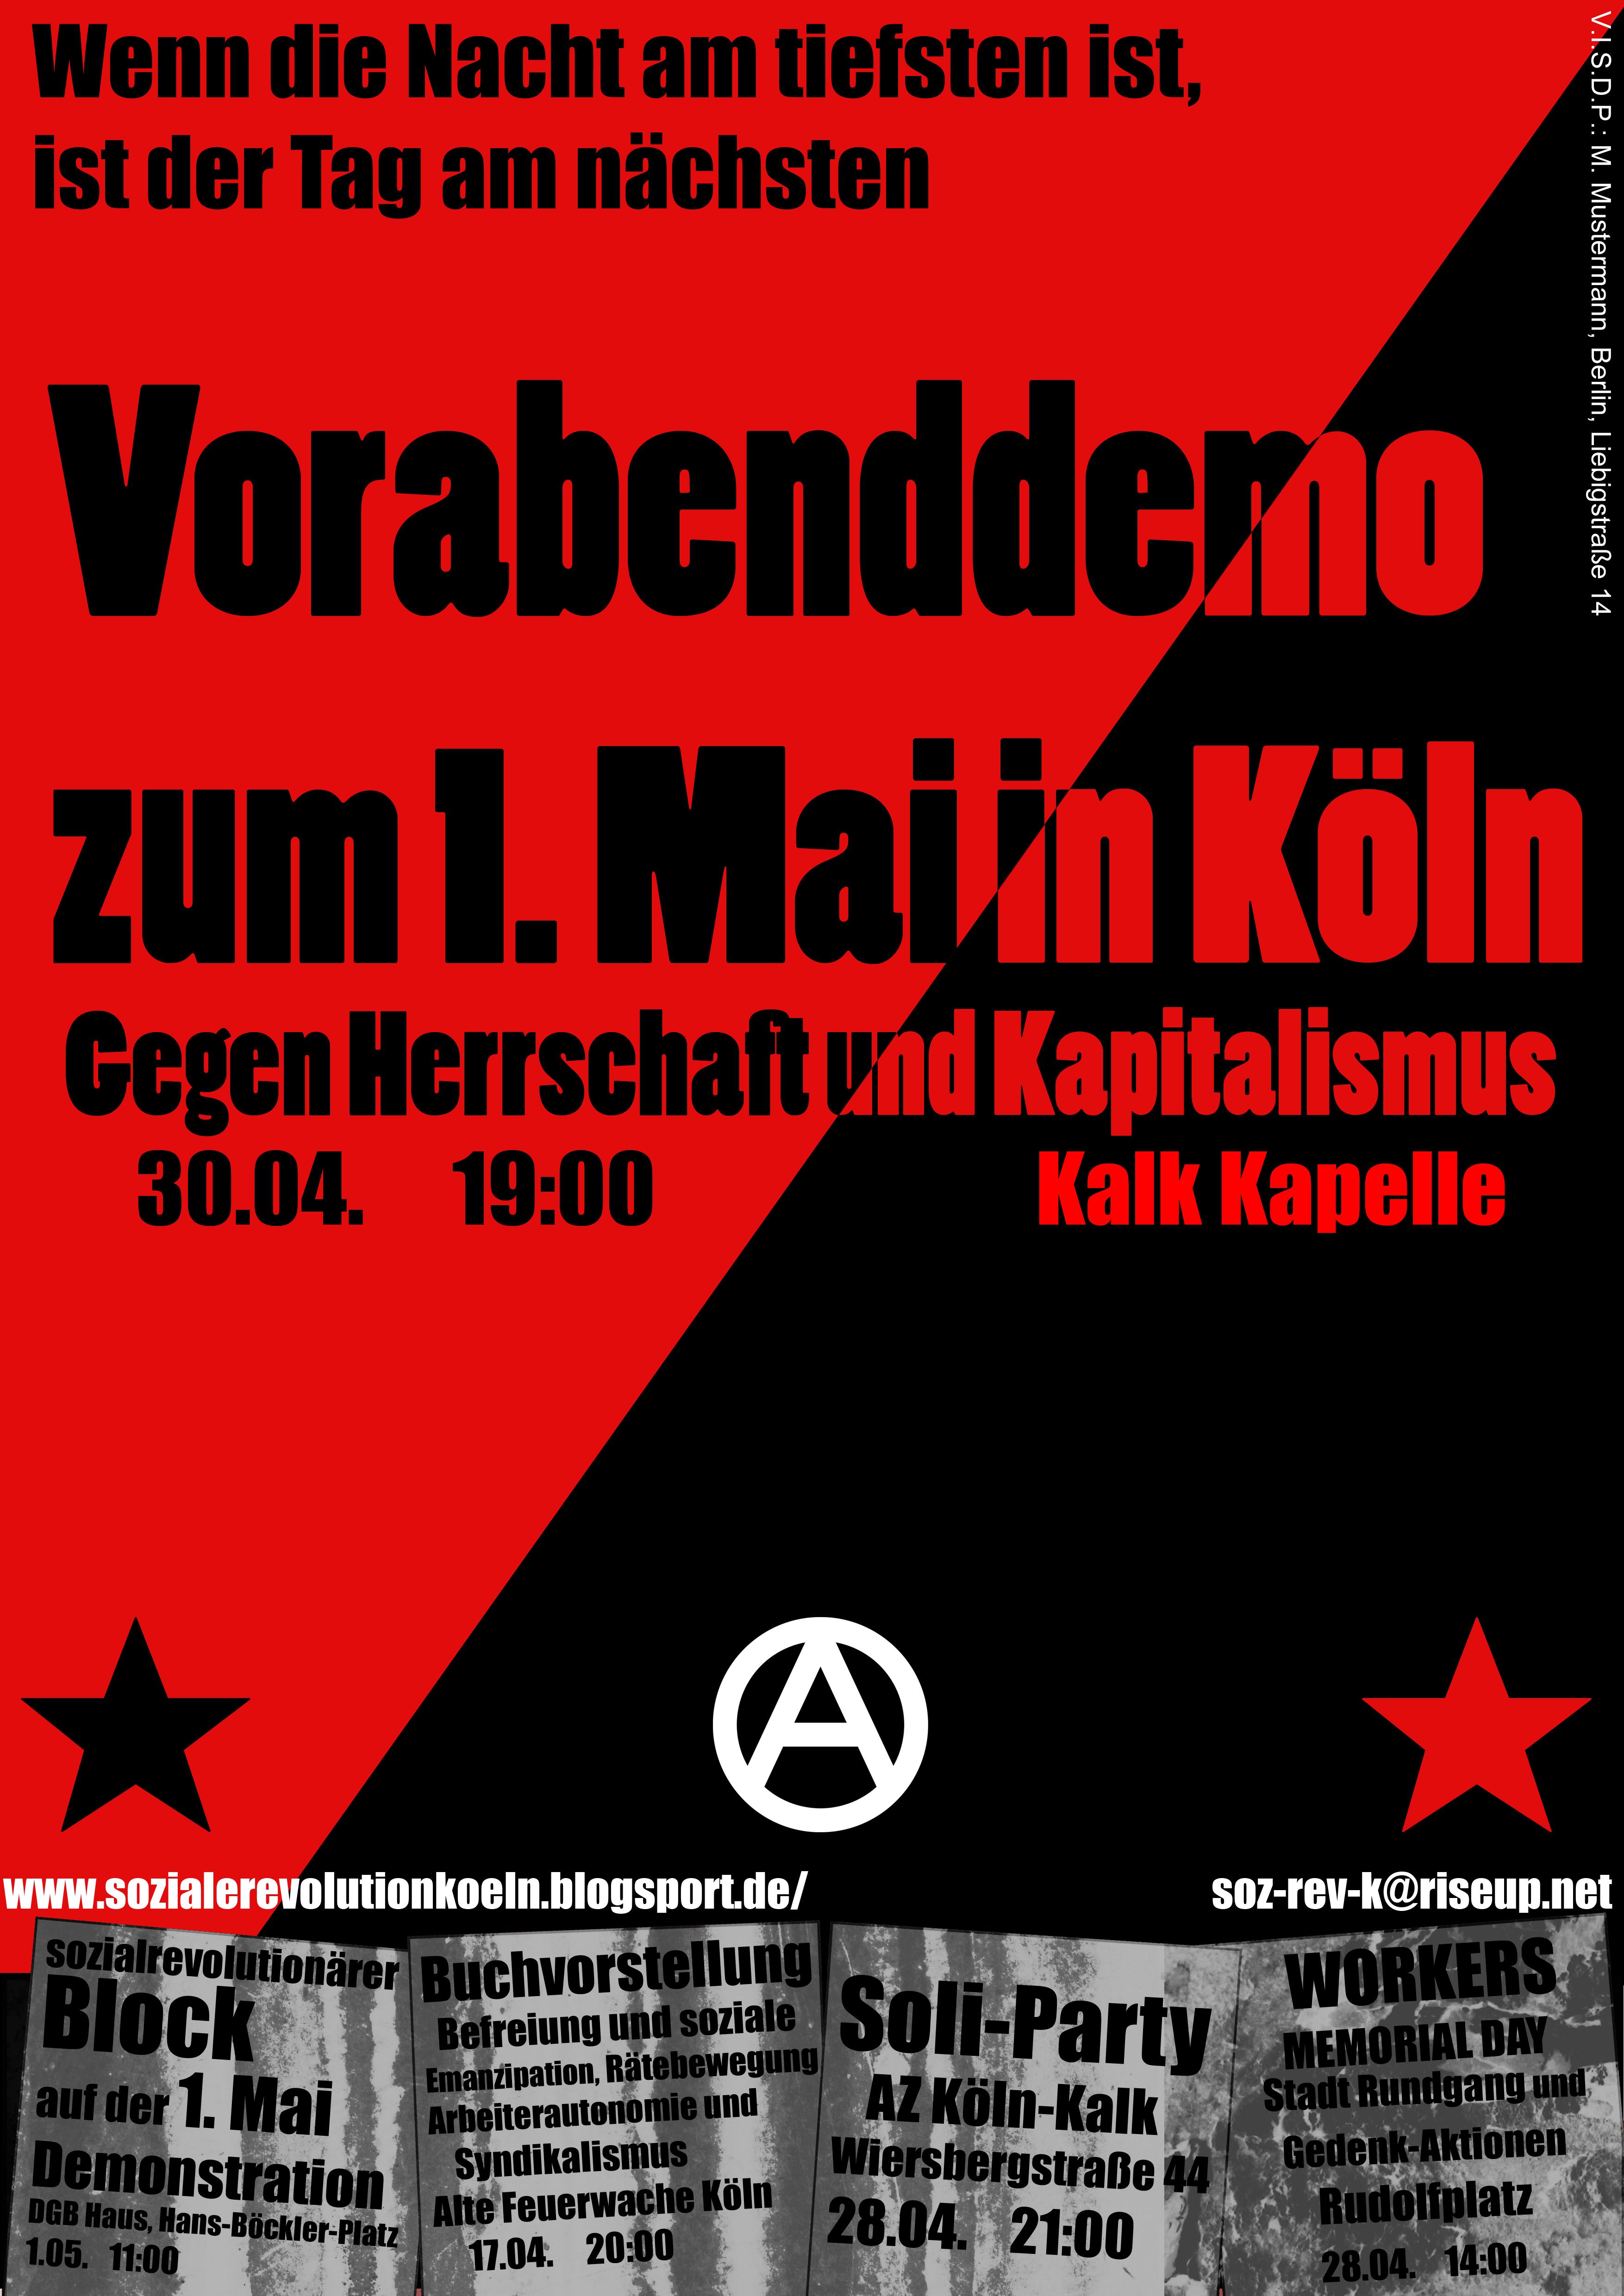 Vorabenddemo zum 1. Mai Köln um 19 Uhr